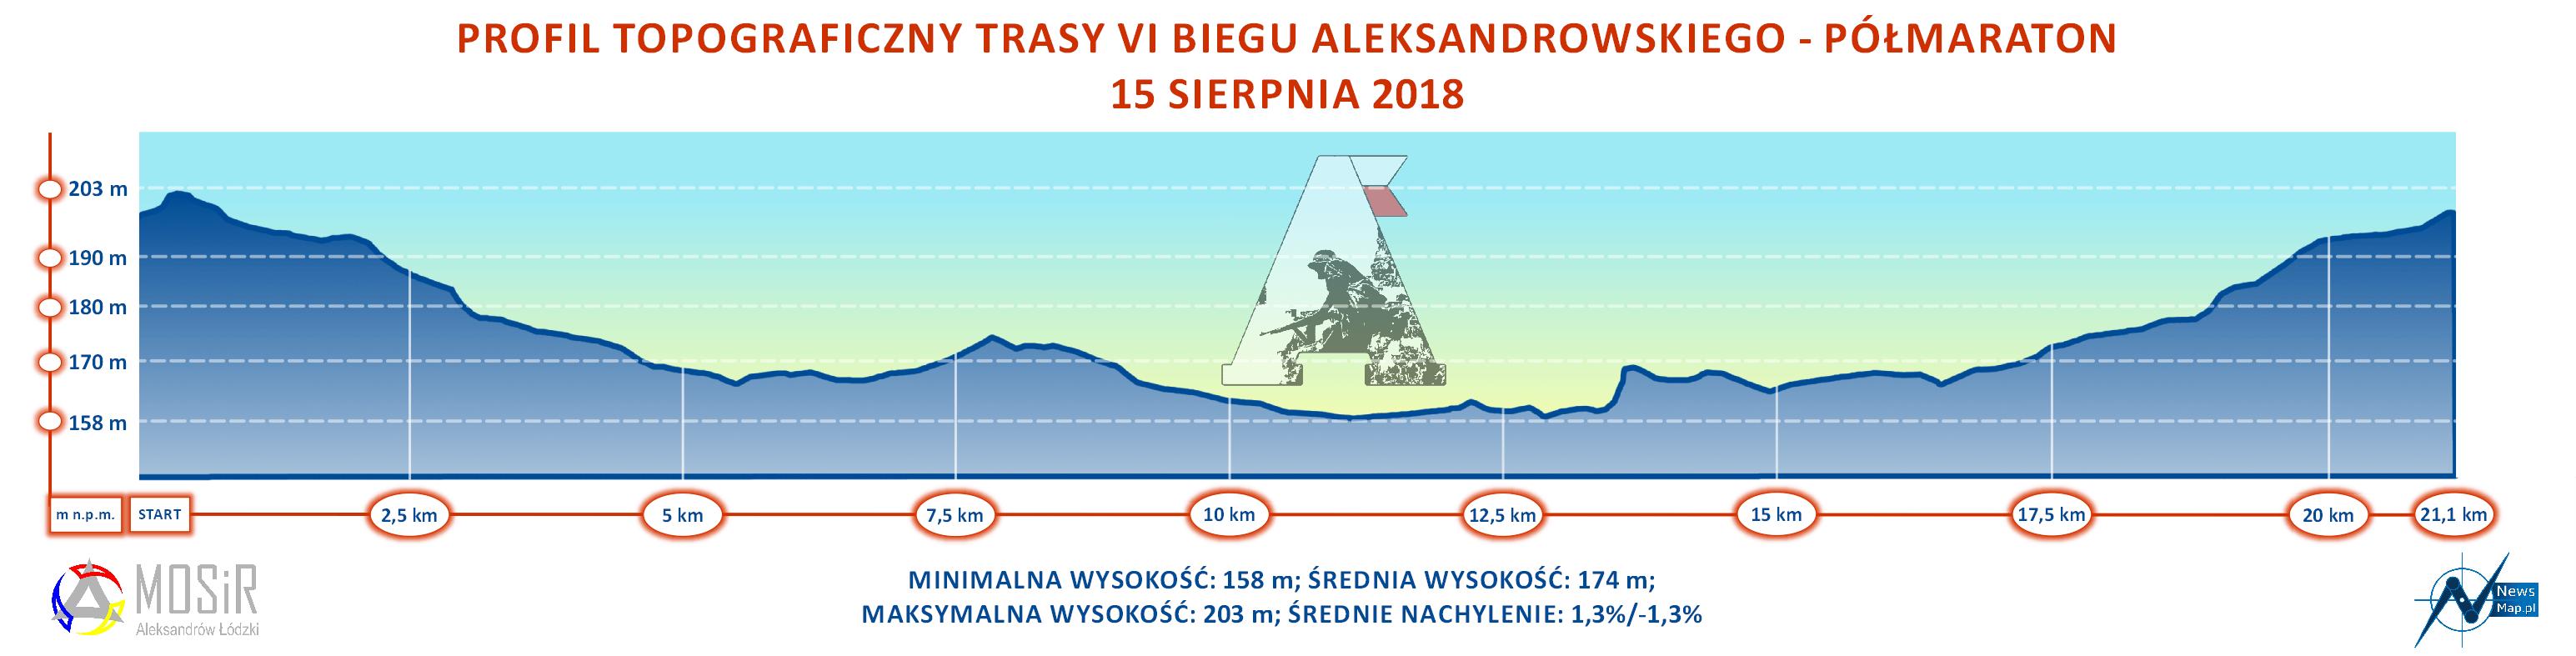 VI Półmaraton Aleksandrowski - profil topograficzny